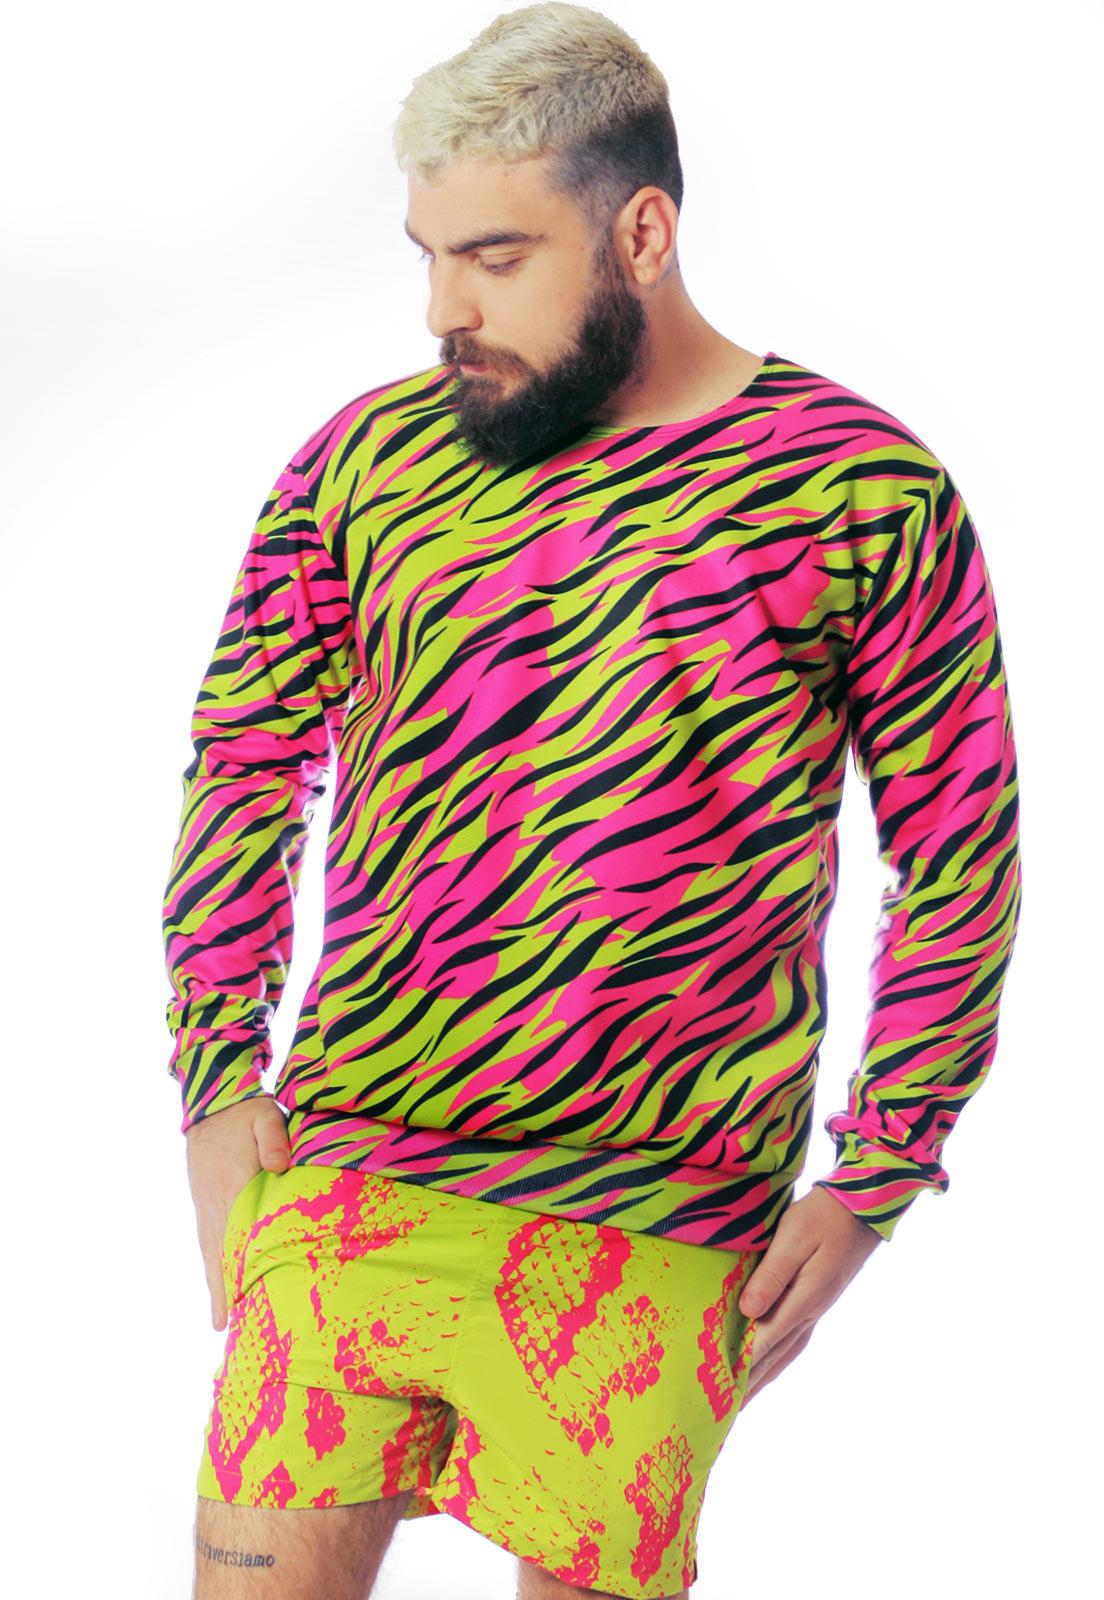 Shorts Neon Estampado ElephunK Sem Gênero Amarelo